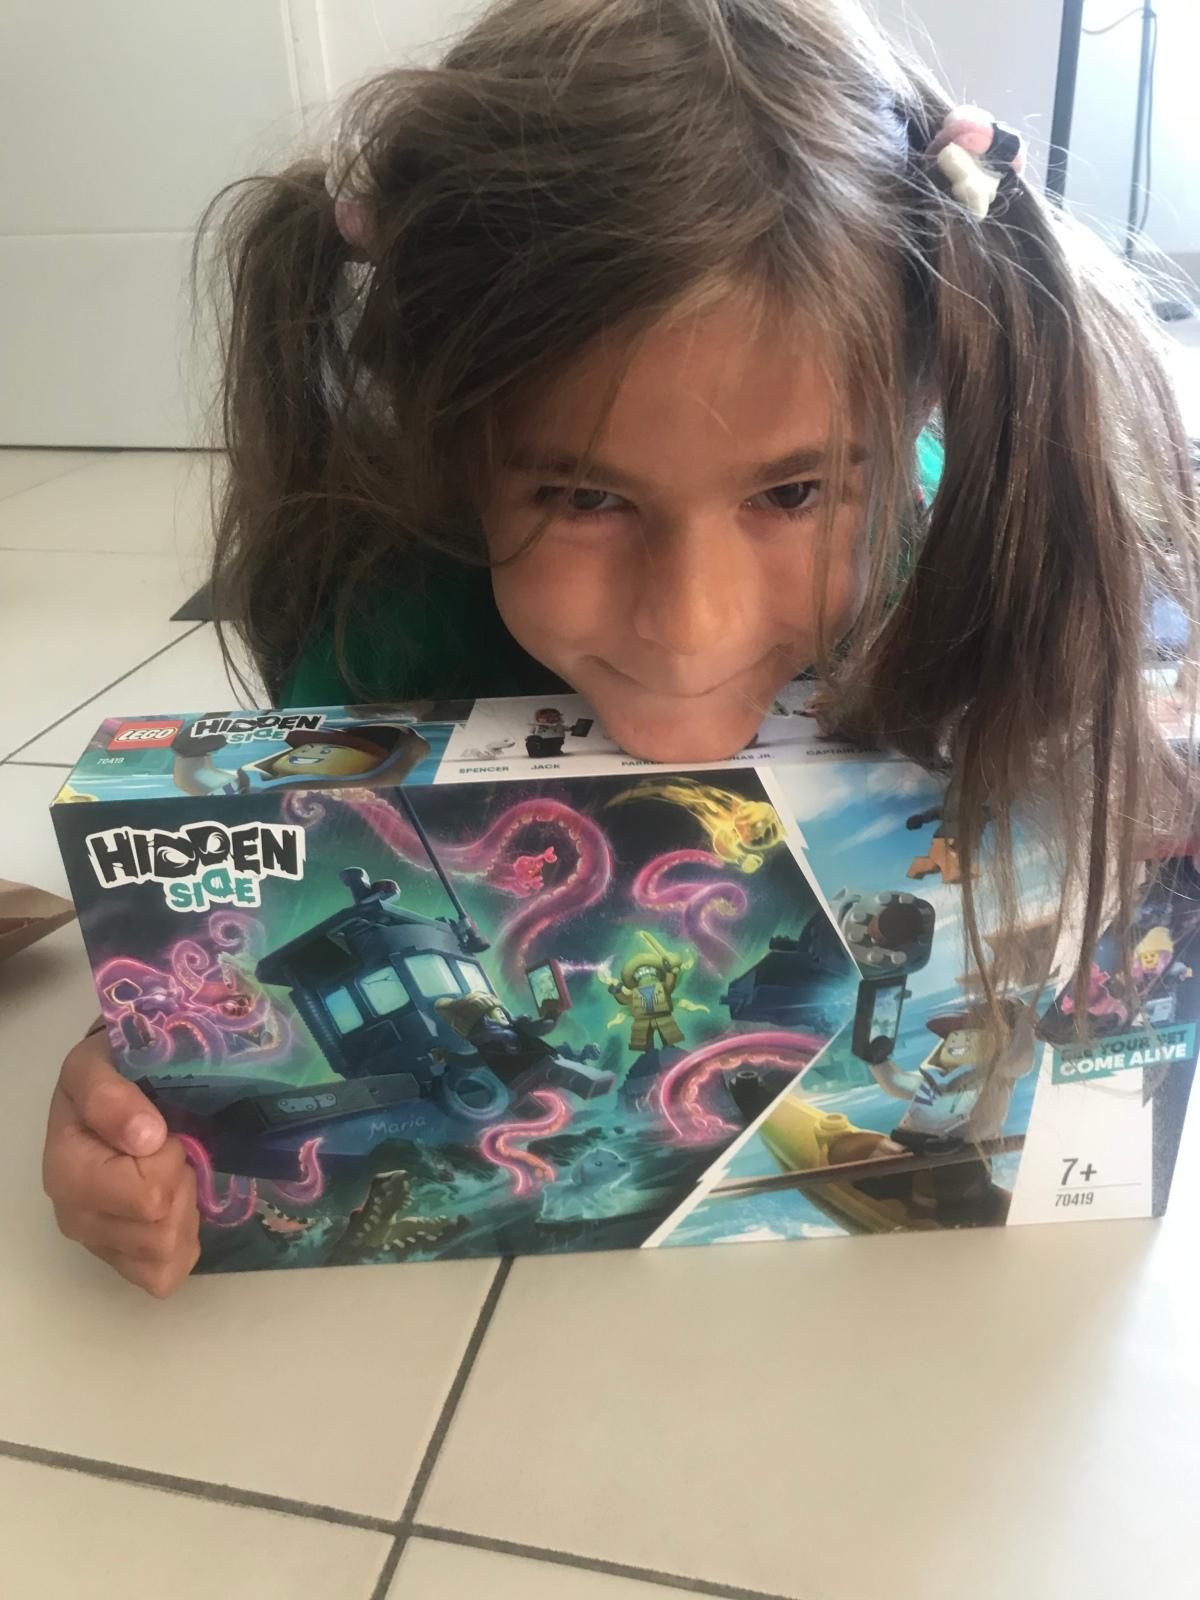 Avec Lego Hidden Side, la chasse aux fantômescommence!